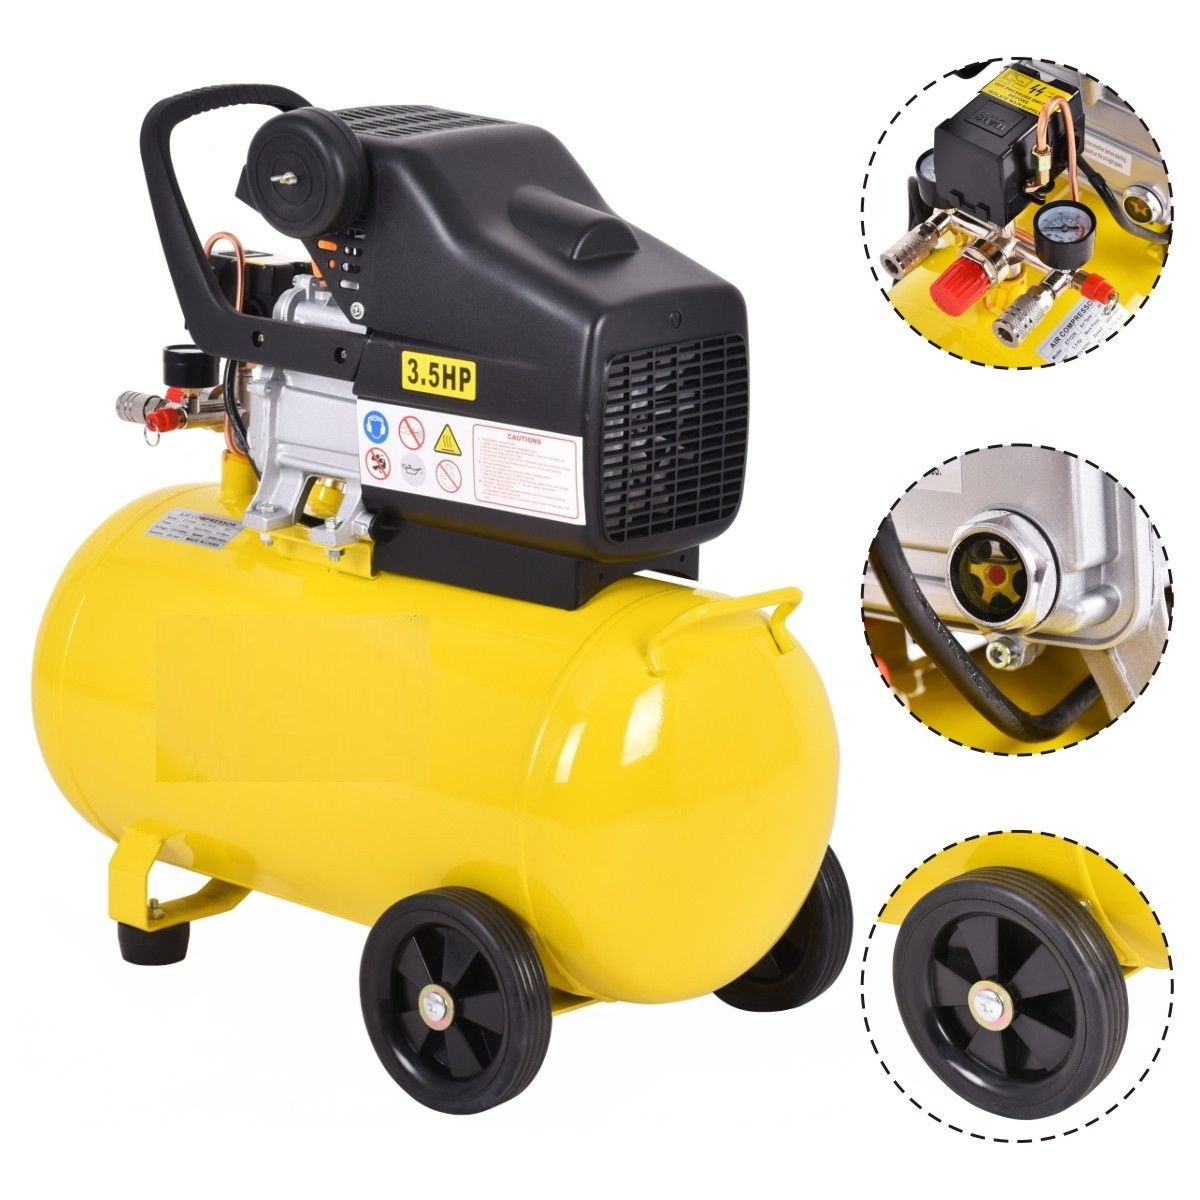 Heavy duty 3 5 hp 110v 10 gallon air compressor adjustable for 3 hp air compressor motor